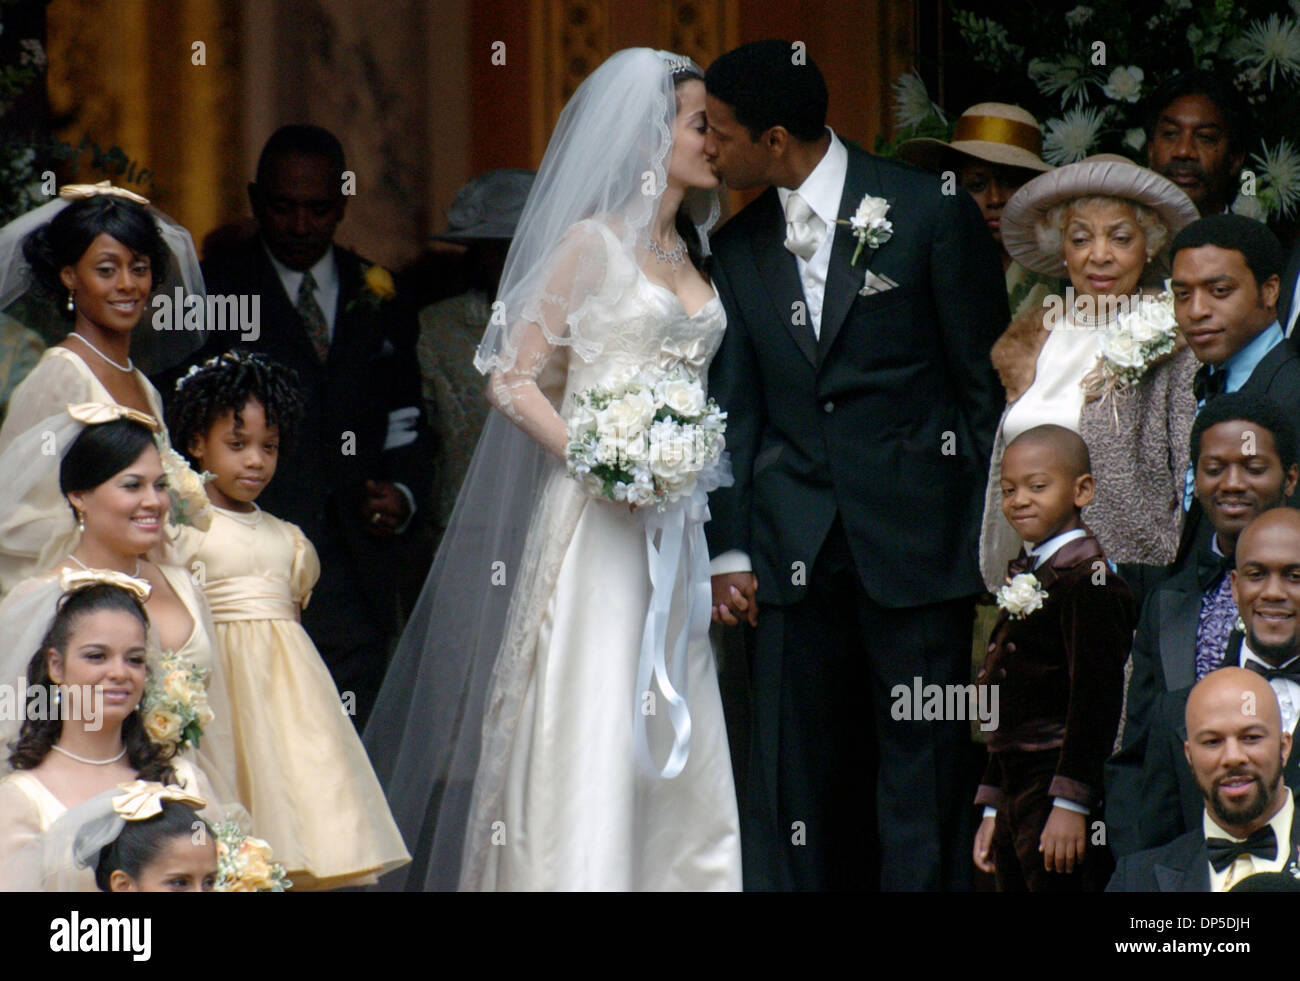 Denzel washington wedding